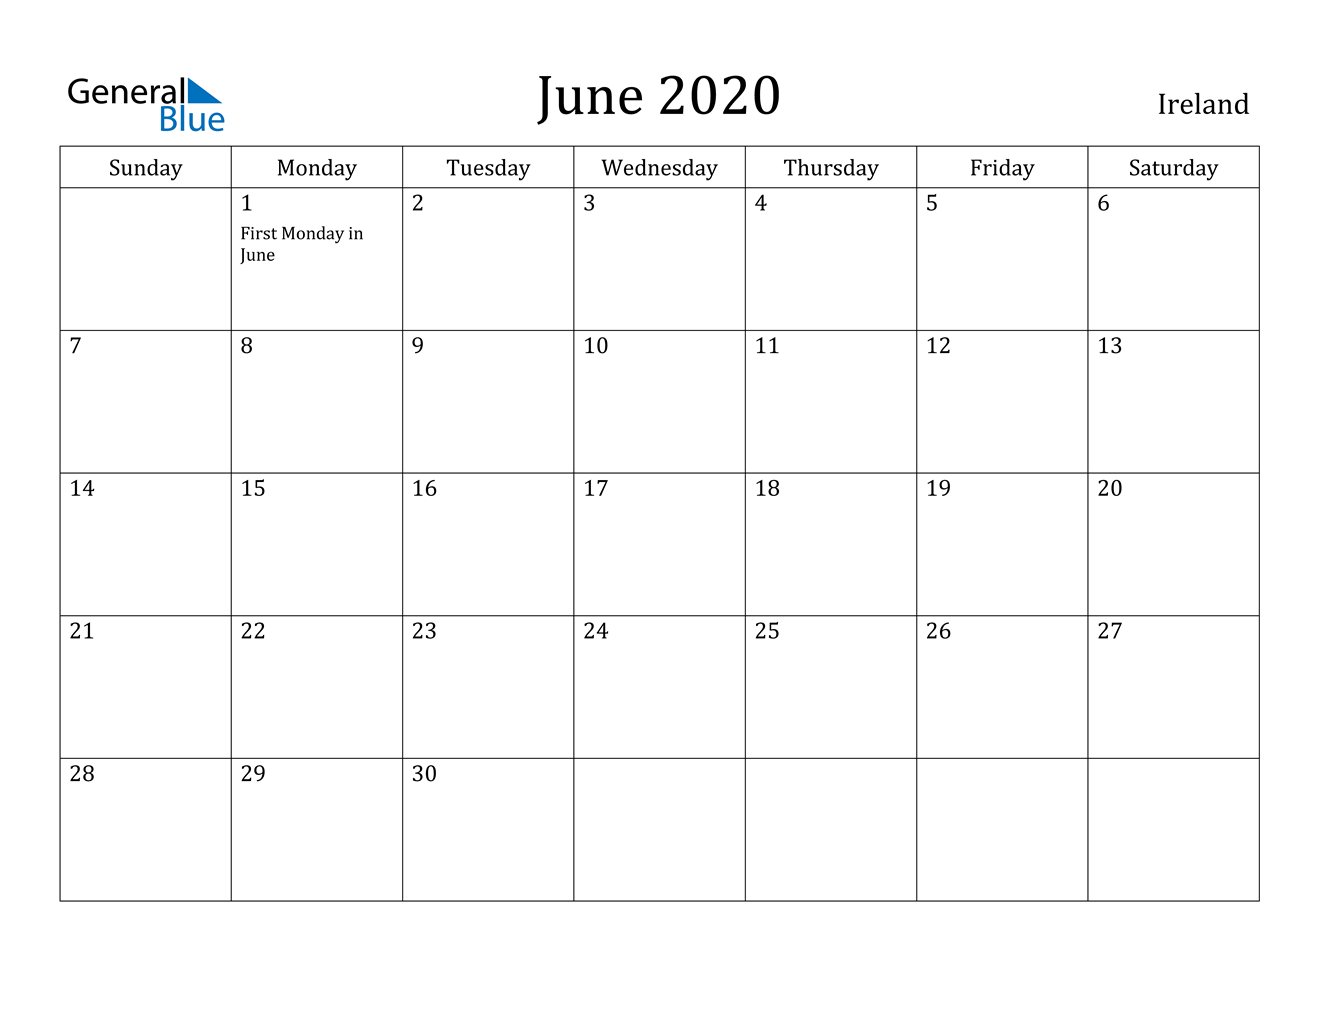 June 2020 Calendar - Ireland